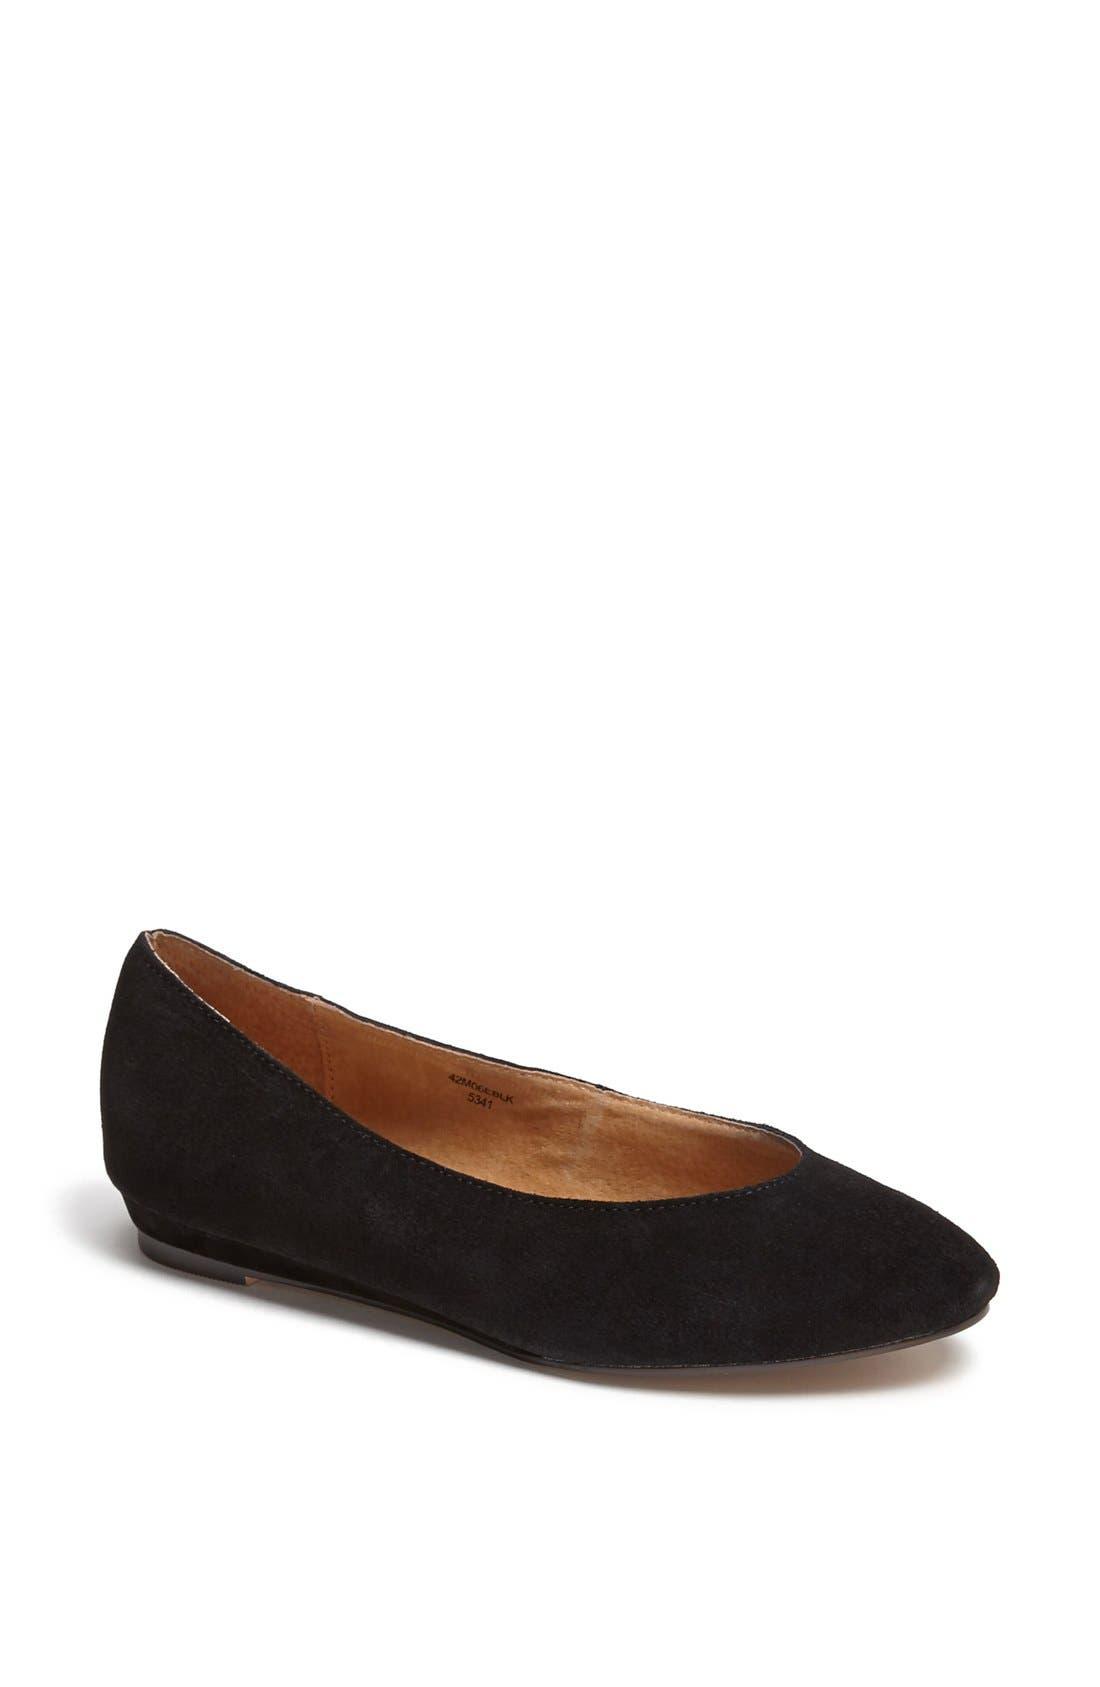 'Mello Mini Wedge' Court Shoe,                         Main,                         color, 001